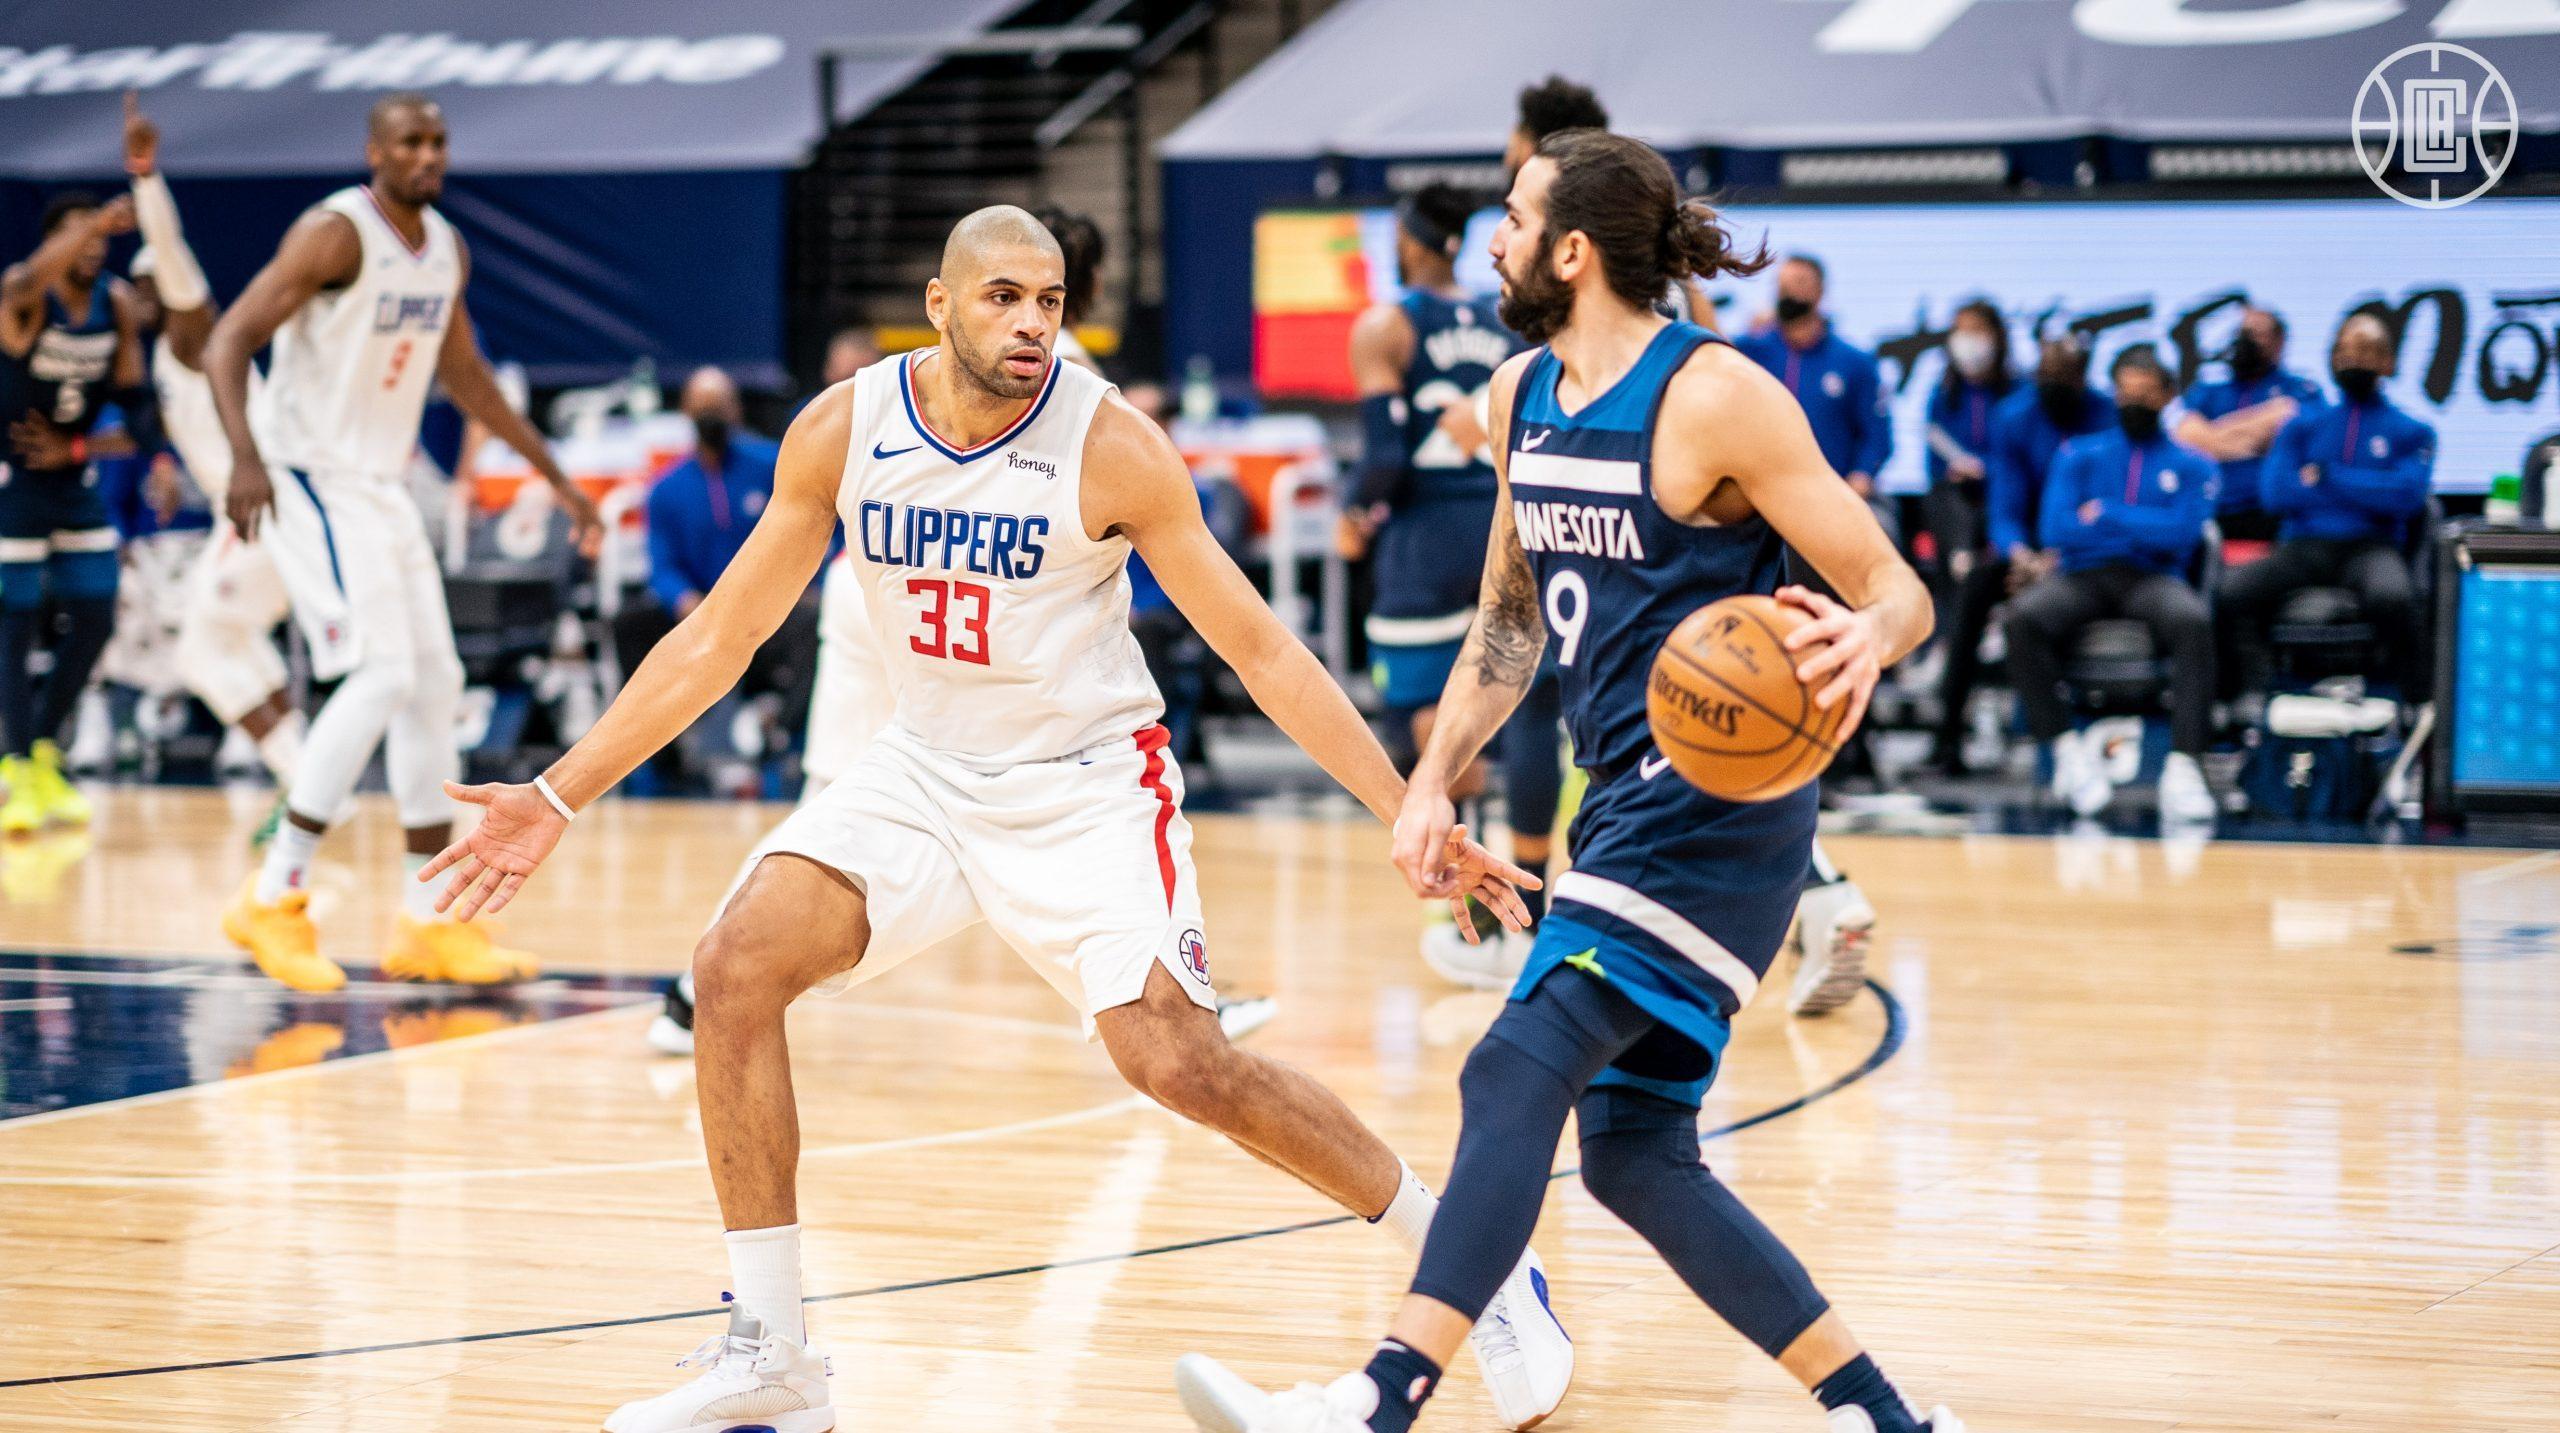 Clippers 2021-2022 Season Preview: Nic Batum